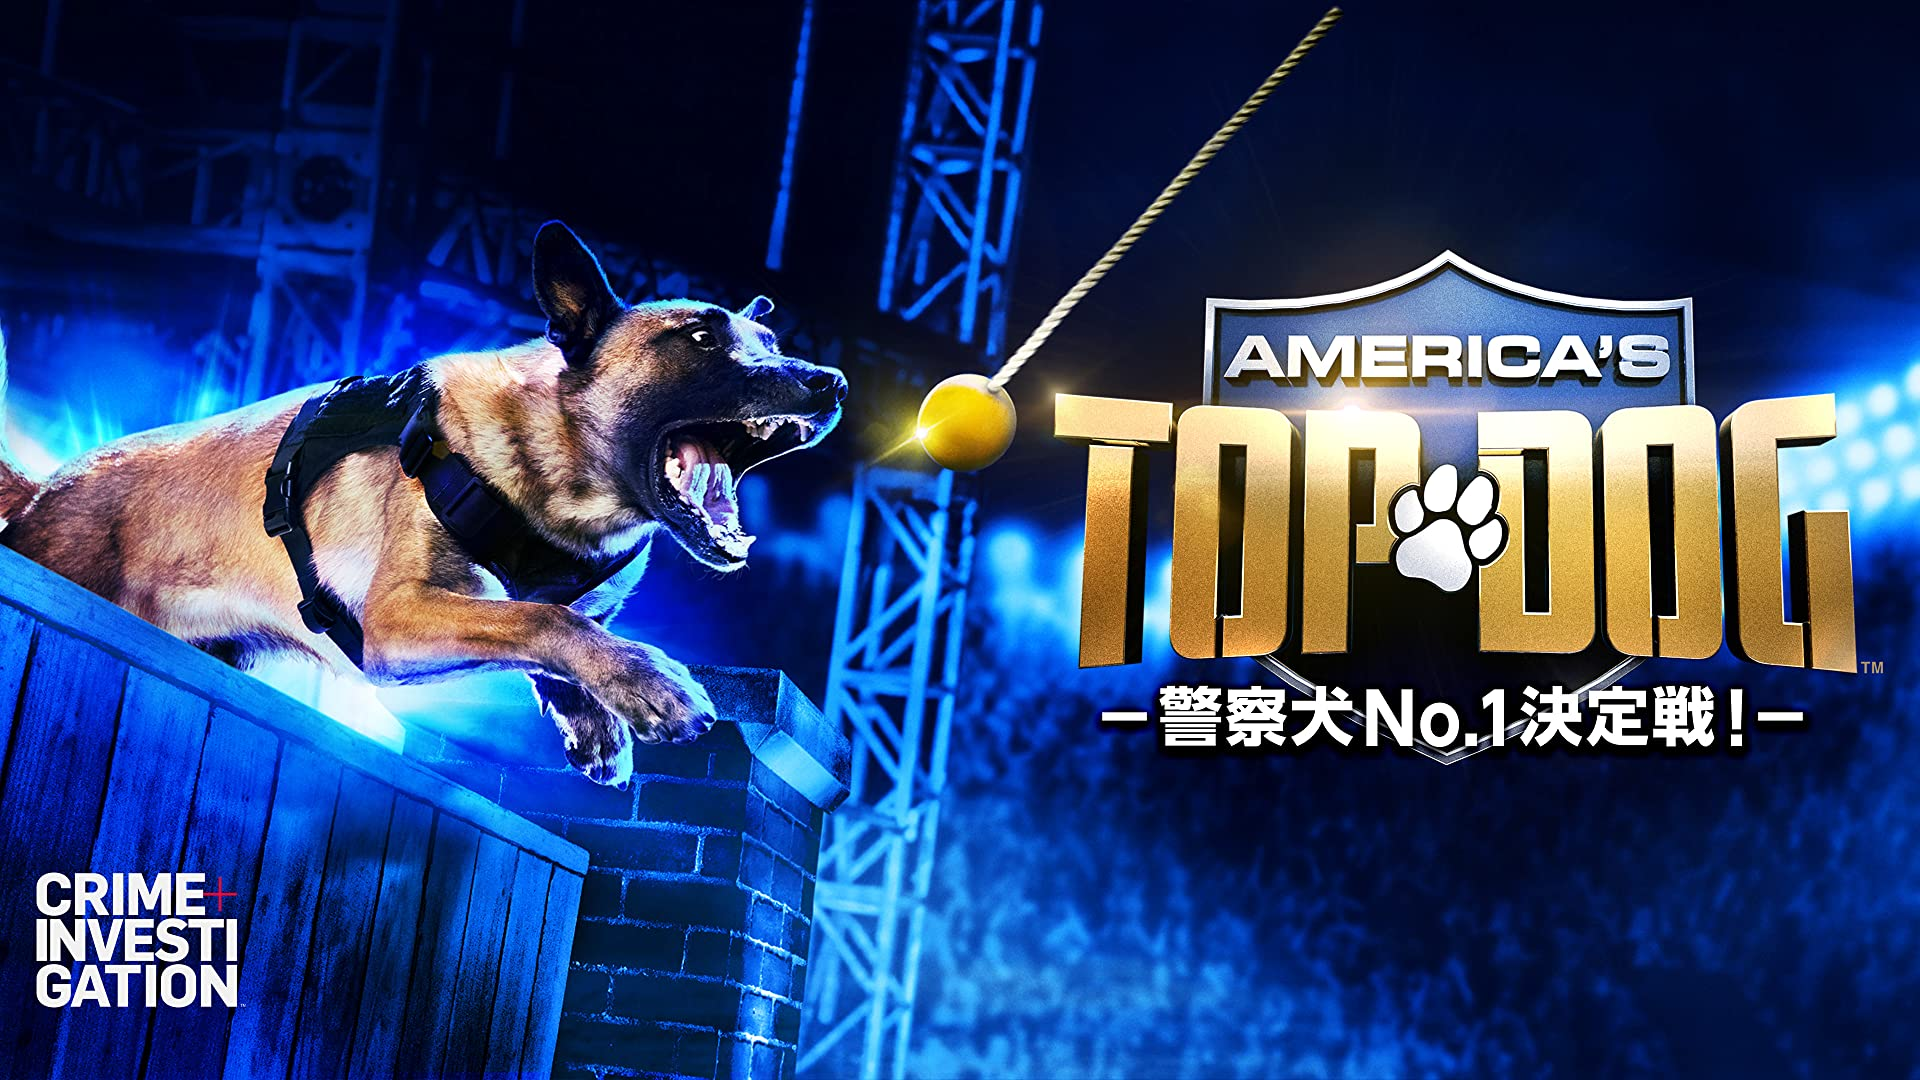 America's Top Dog -警察犬No.1決定戦!-